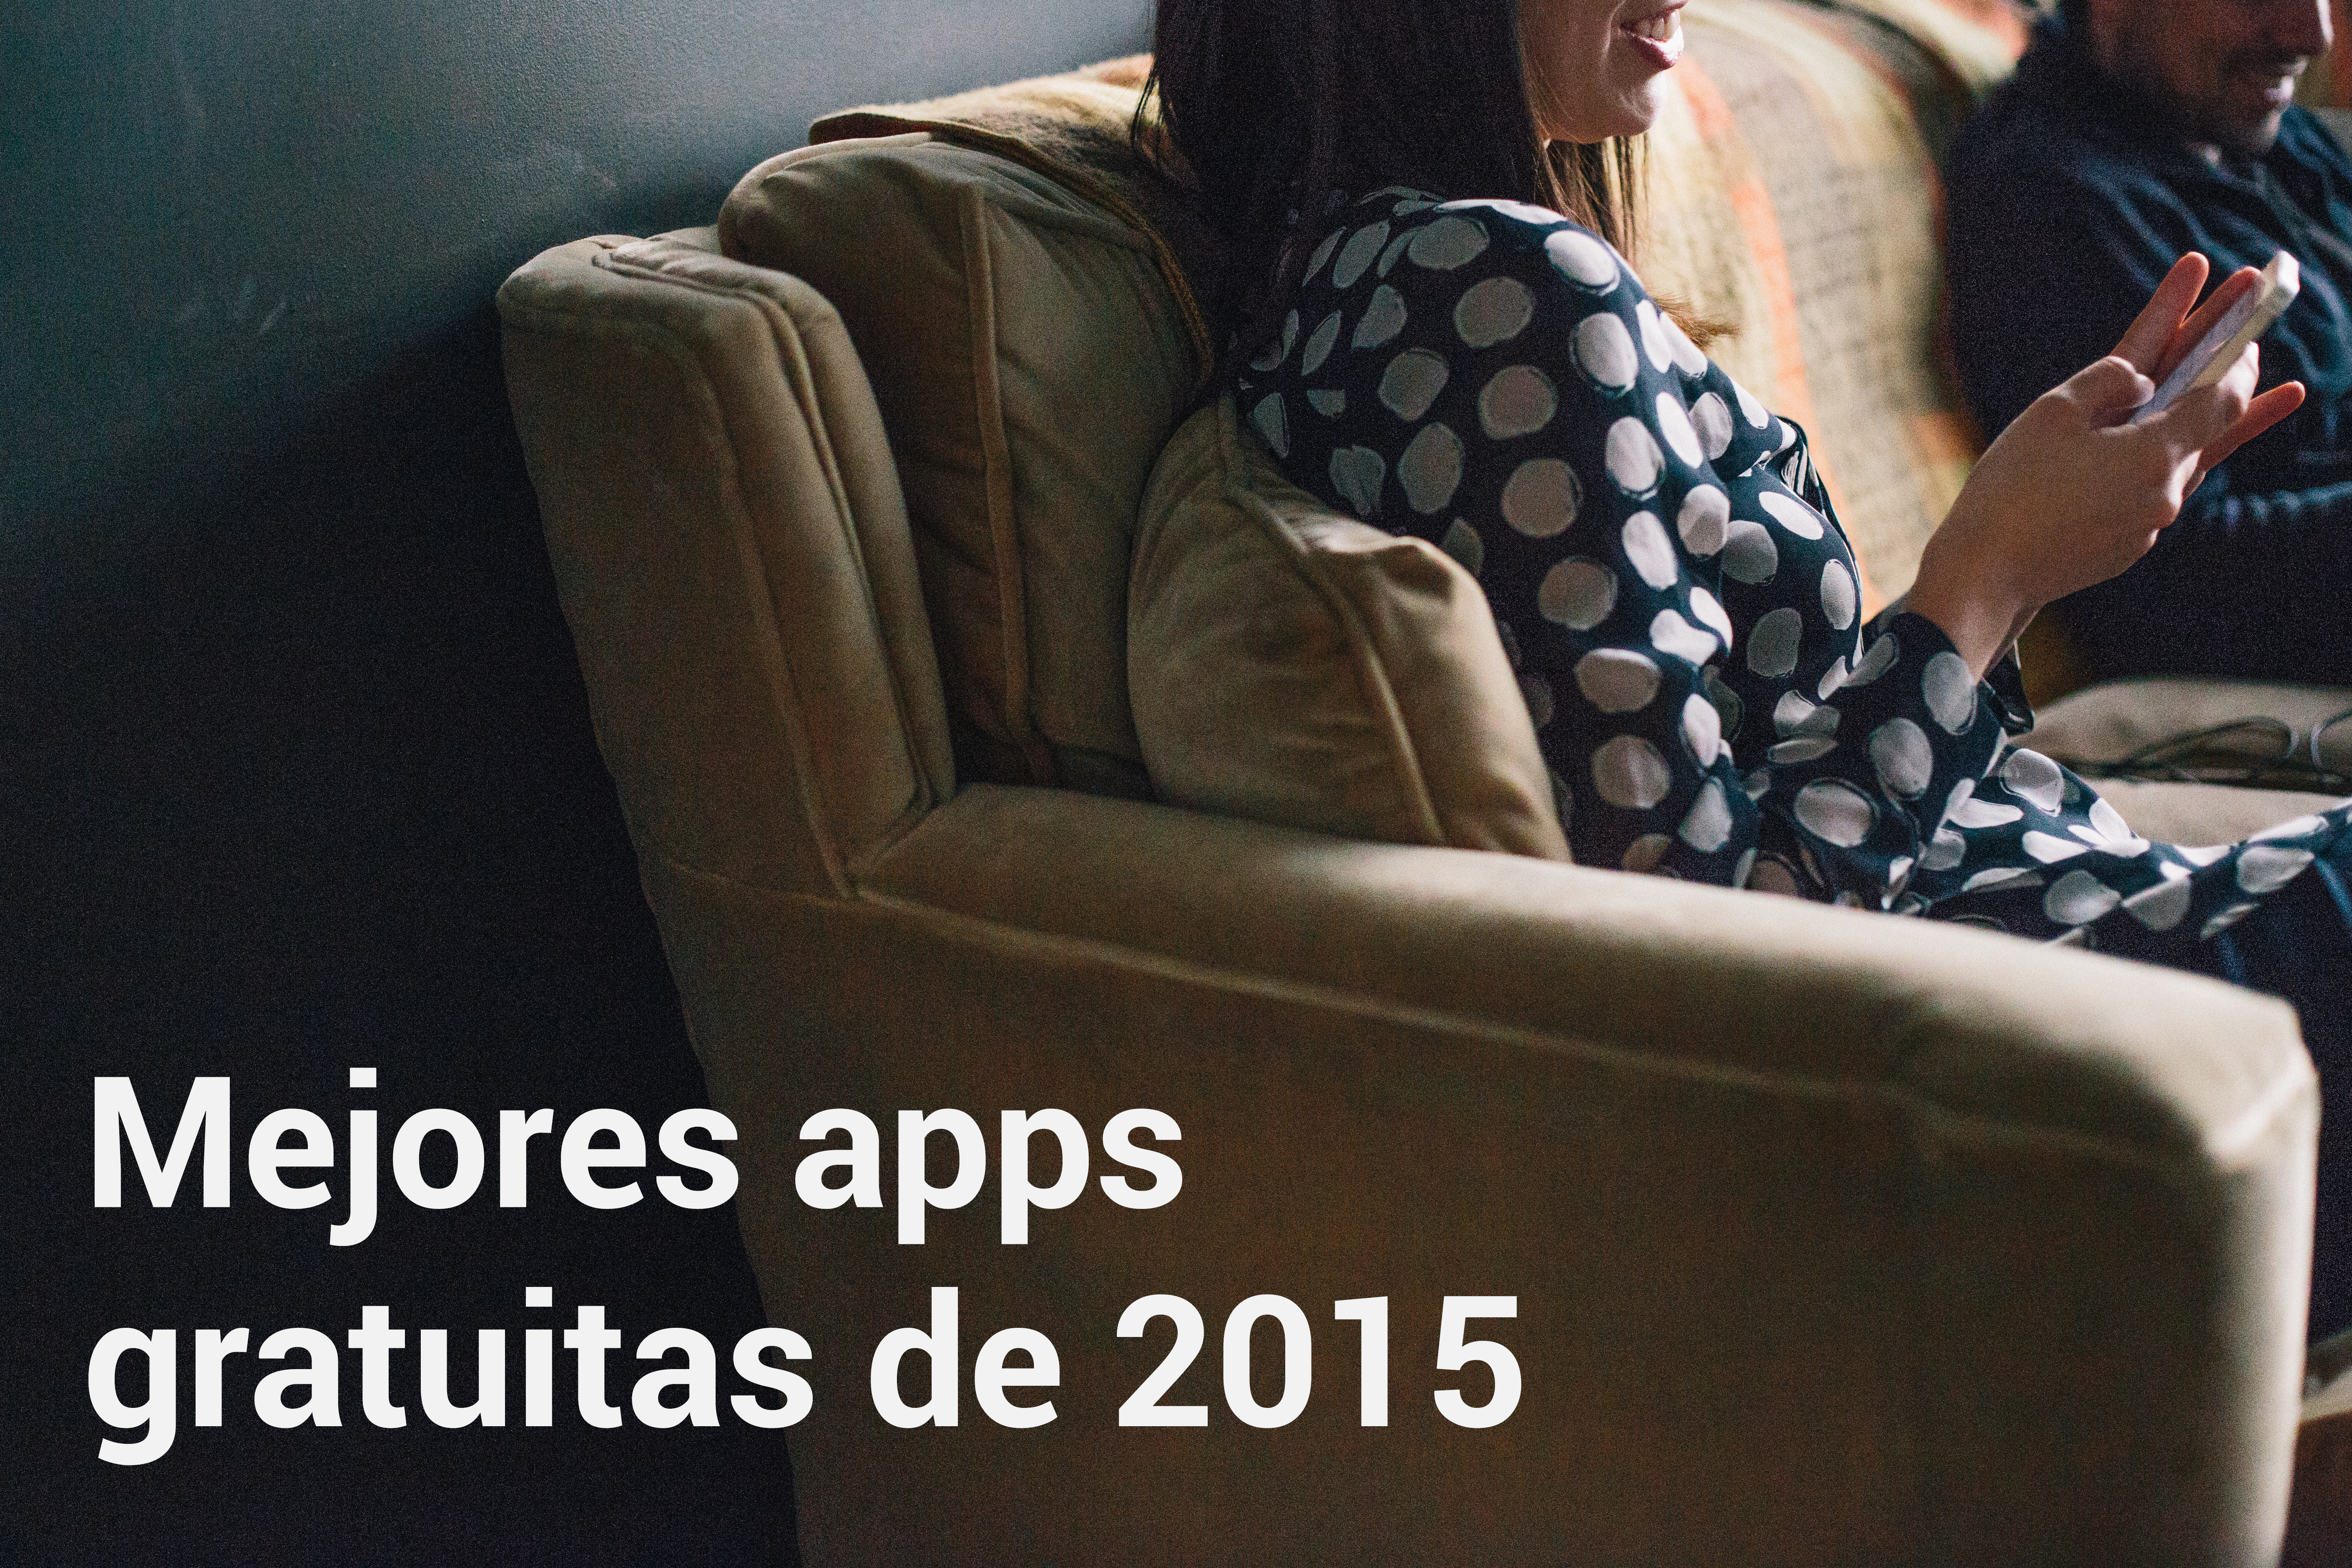 mejores apps gratuitas de 2015